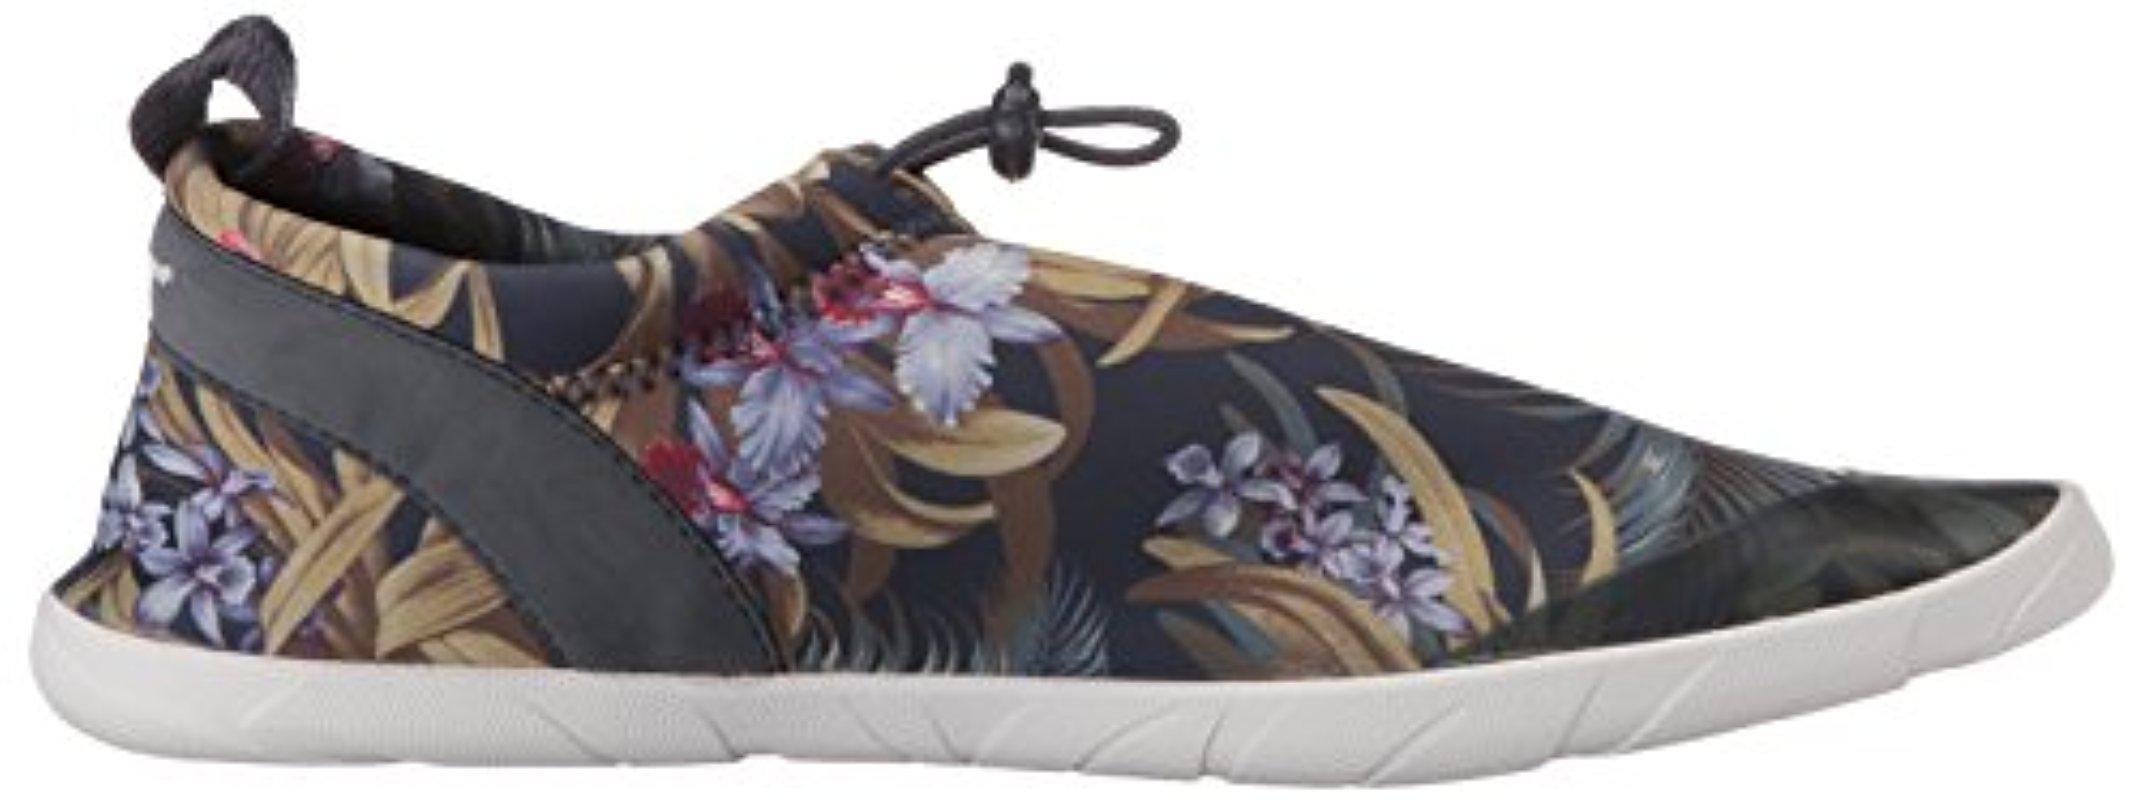 Tommy Bahama Komomo Island Water Shoe